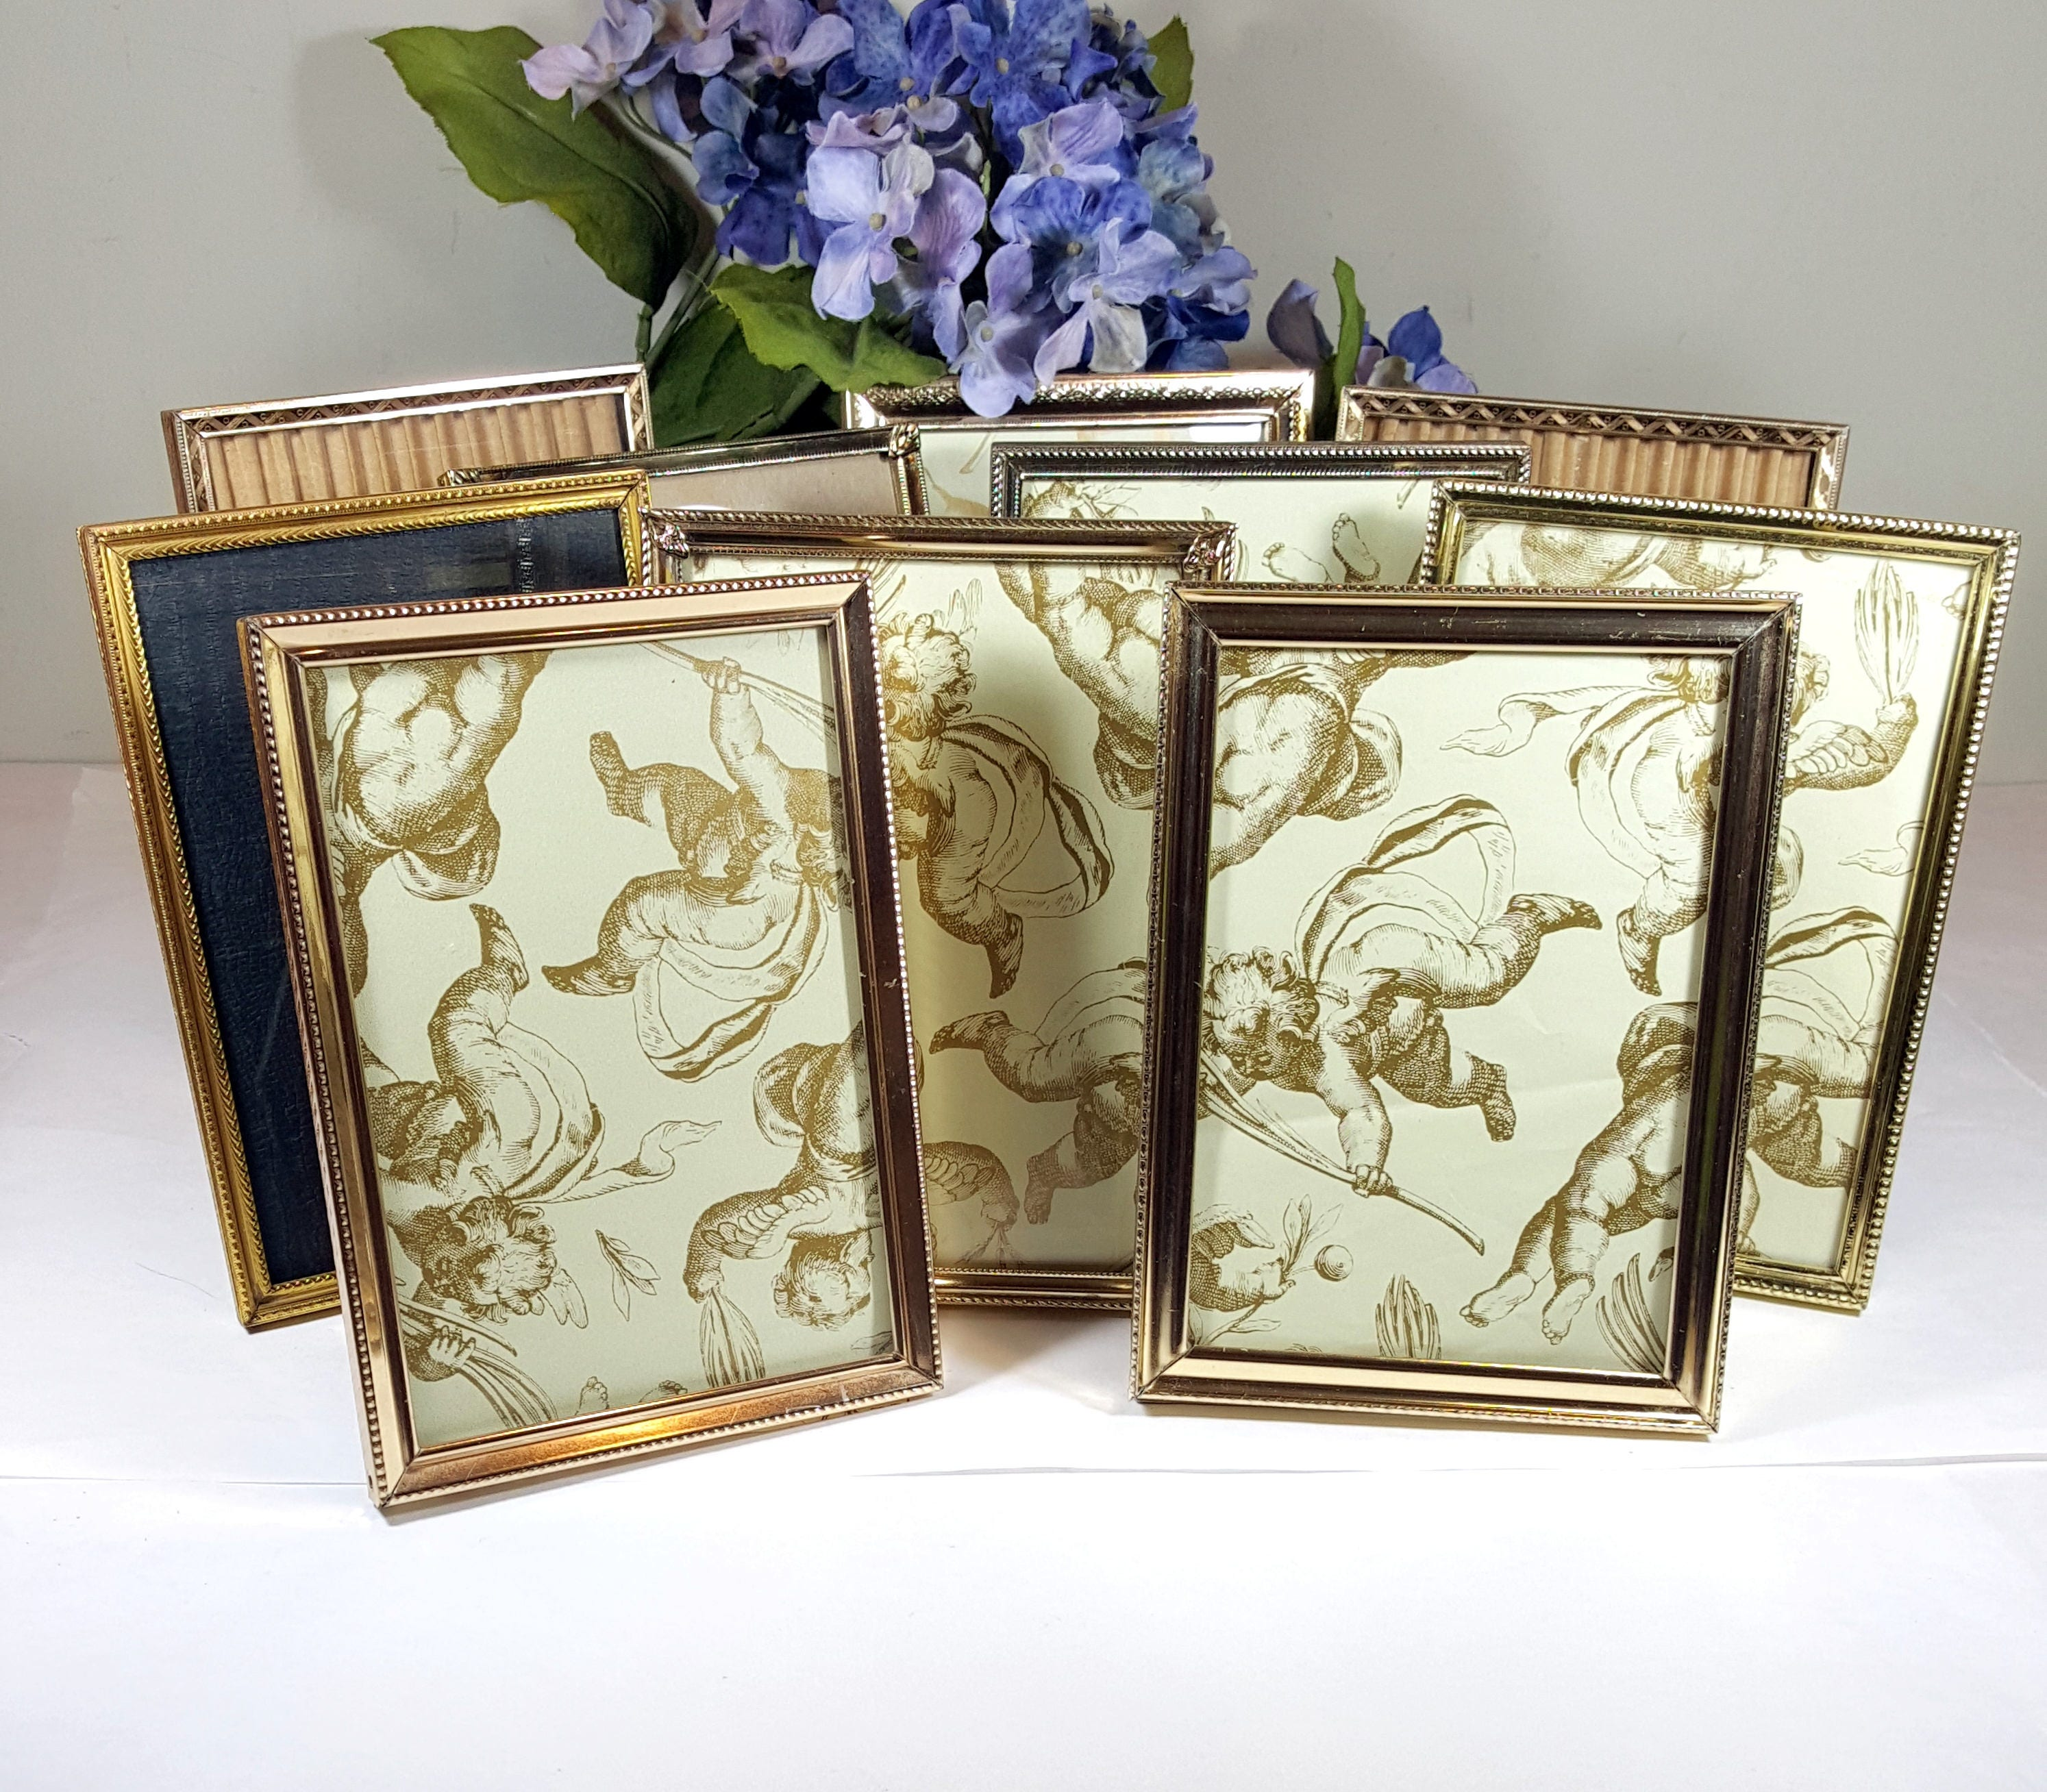 10 vintage gold metal frames 5x7 tabletop standing frames wedding sold by framecottage jeuxipadfo Choice Image